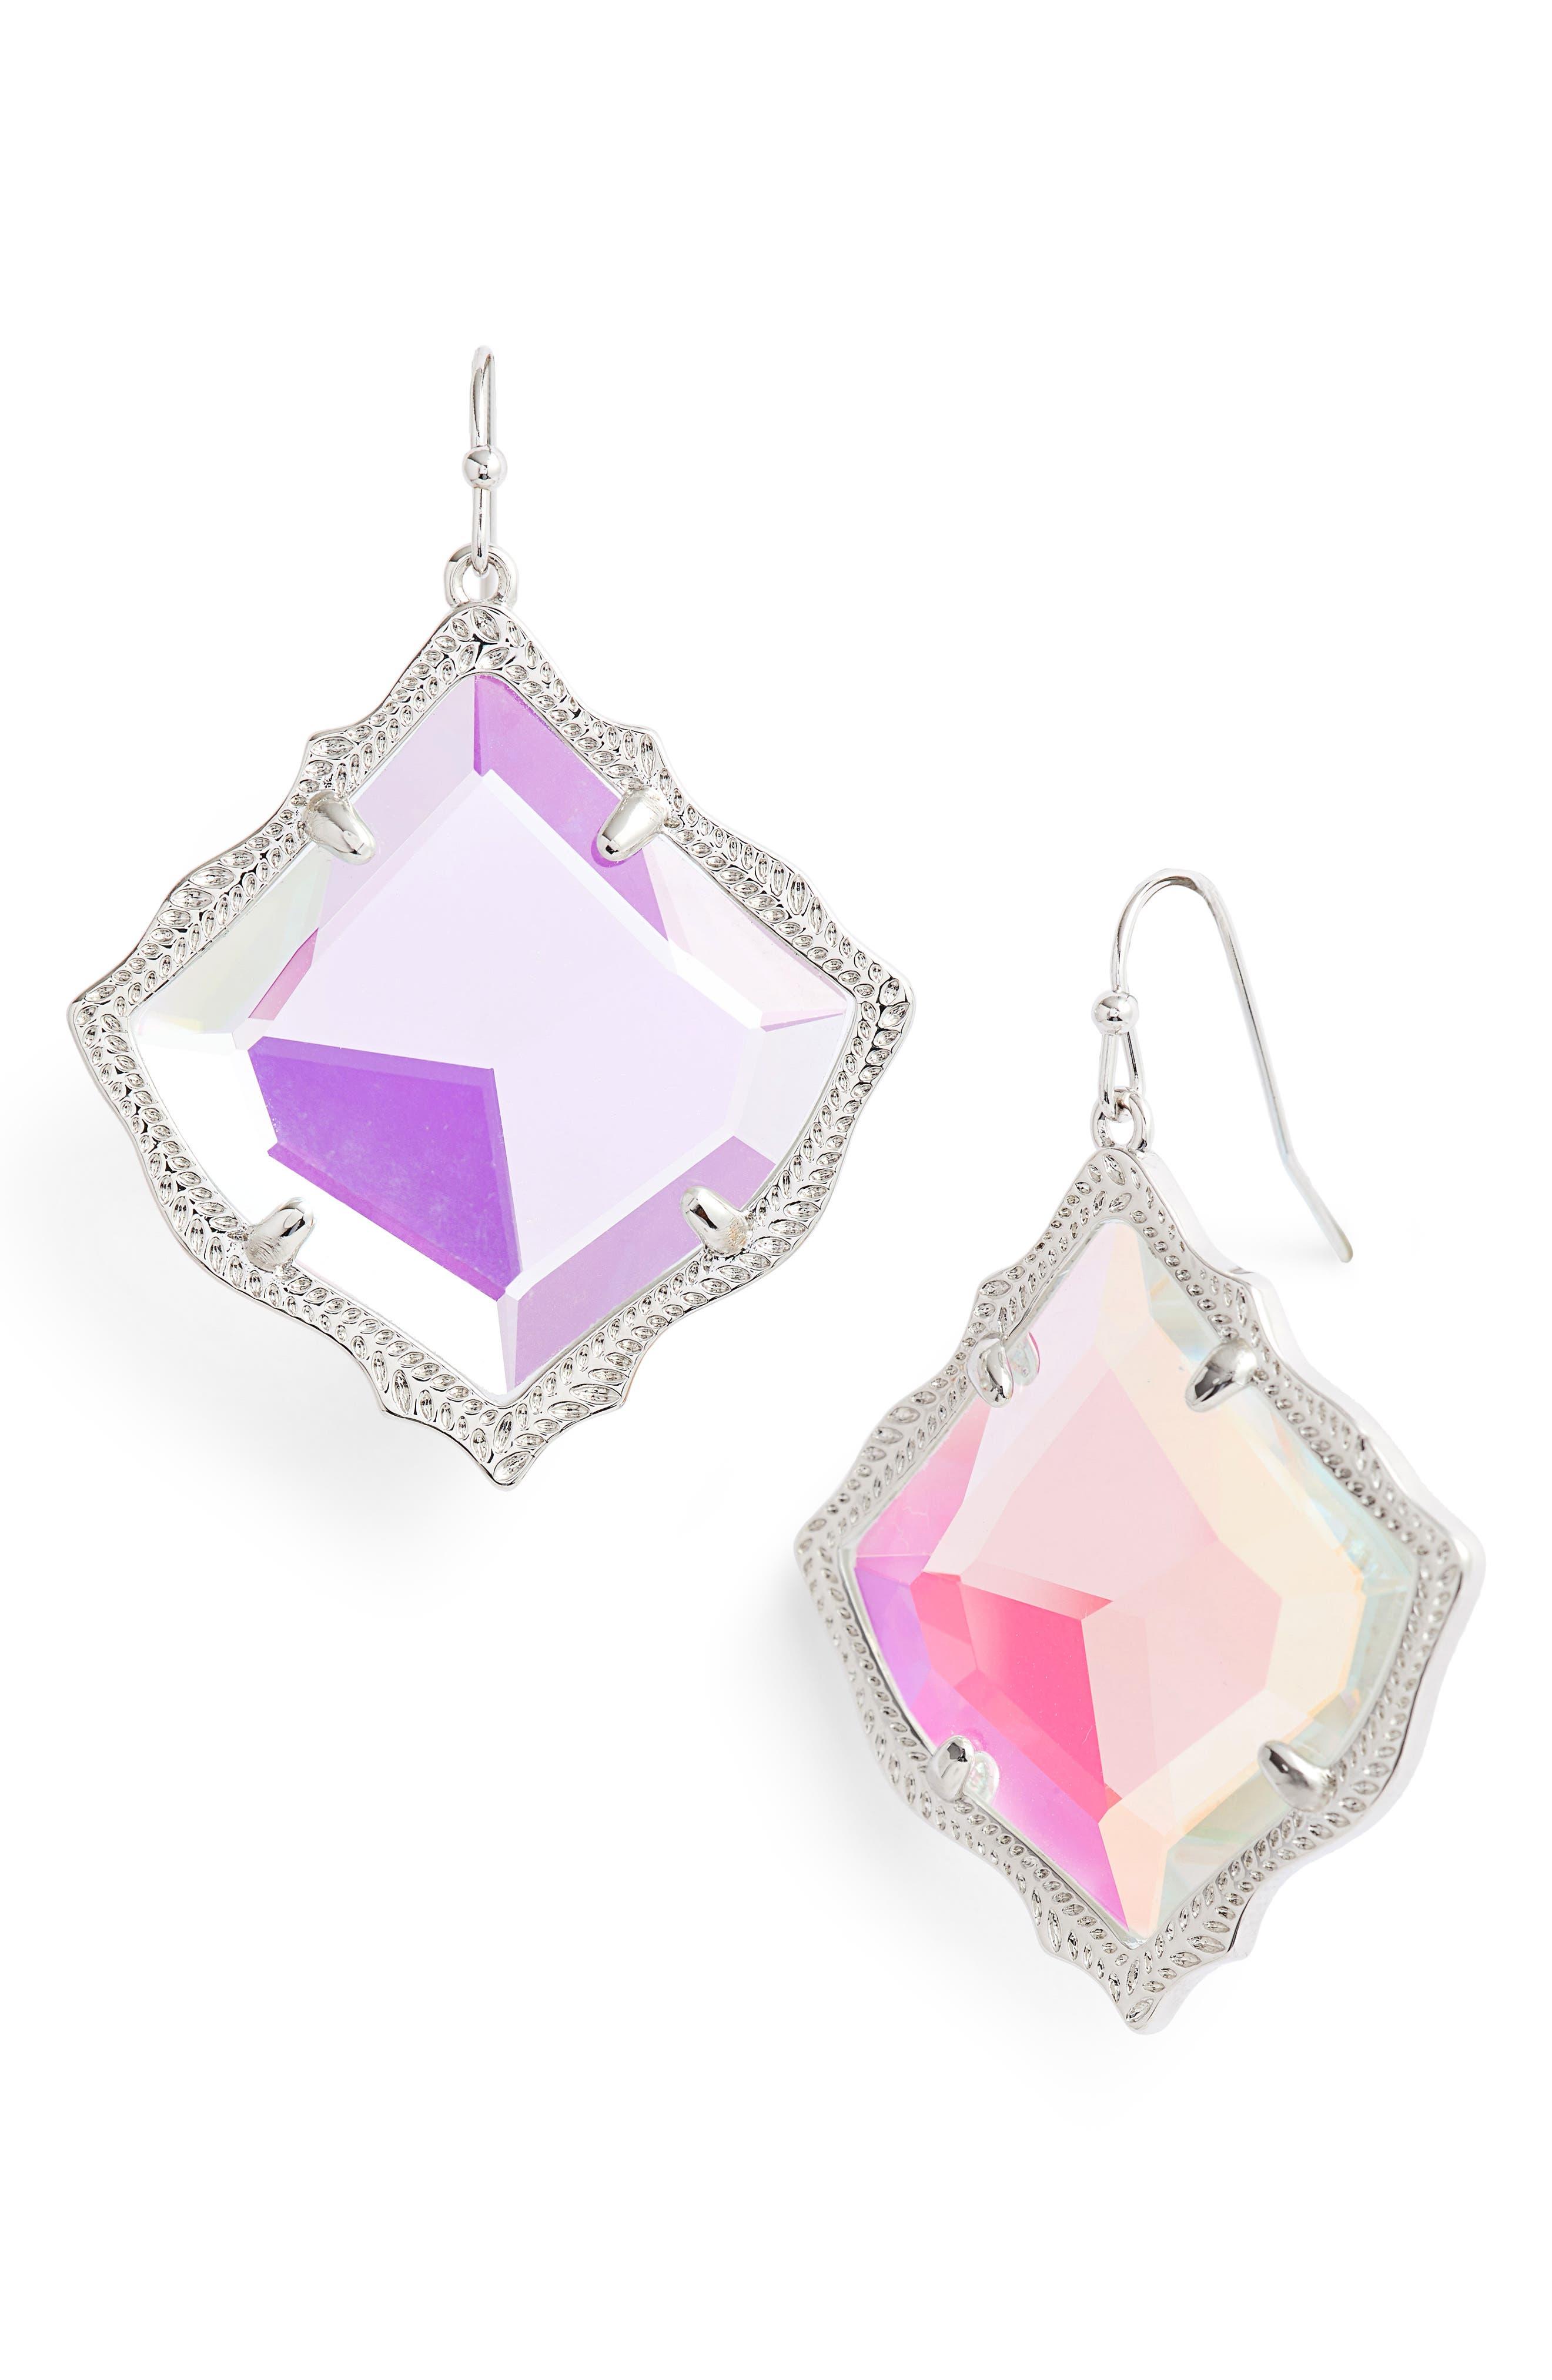 Kirsten Drop Earrings,                             Main thumbnail 1, color,                             Dichroic Glass/ Silver